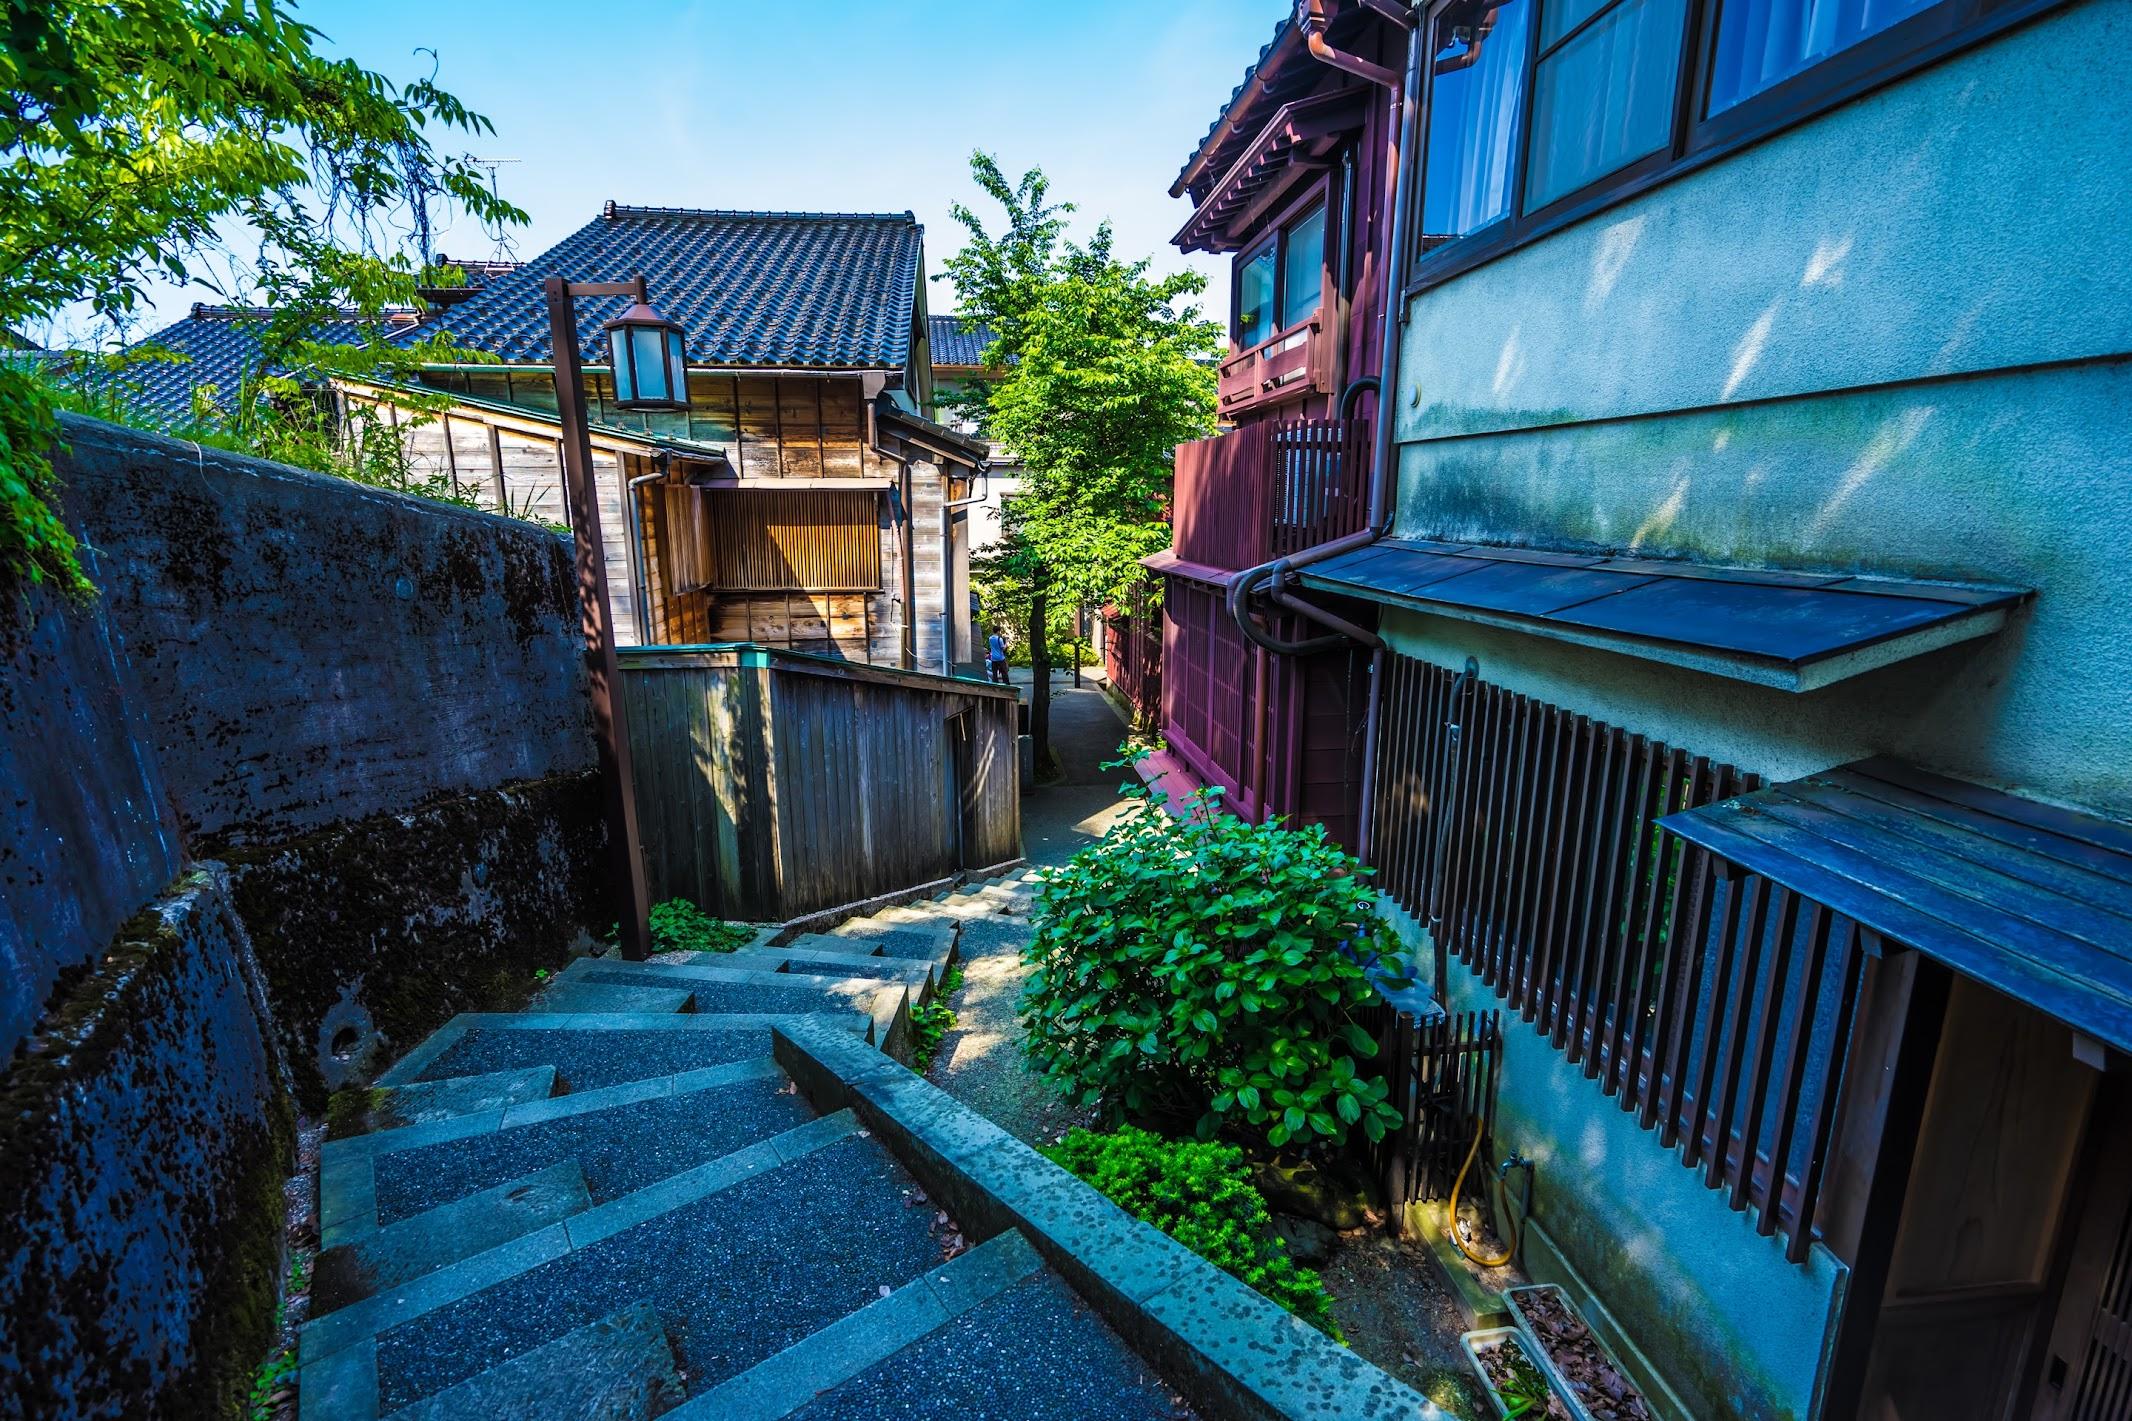 Kanazawa Kazue-machi Chaya District Kuragari-zaka2